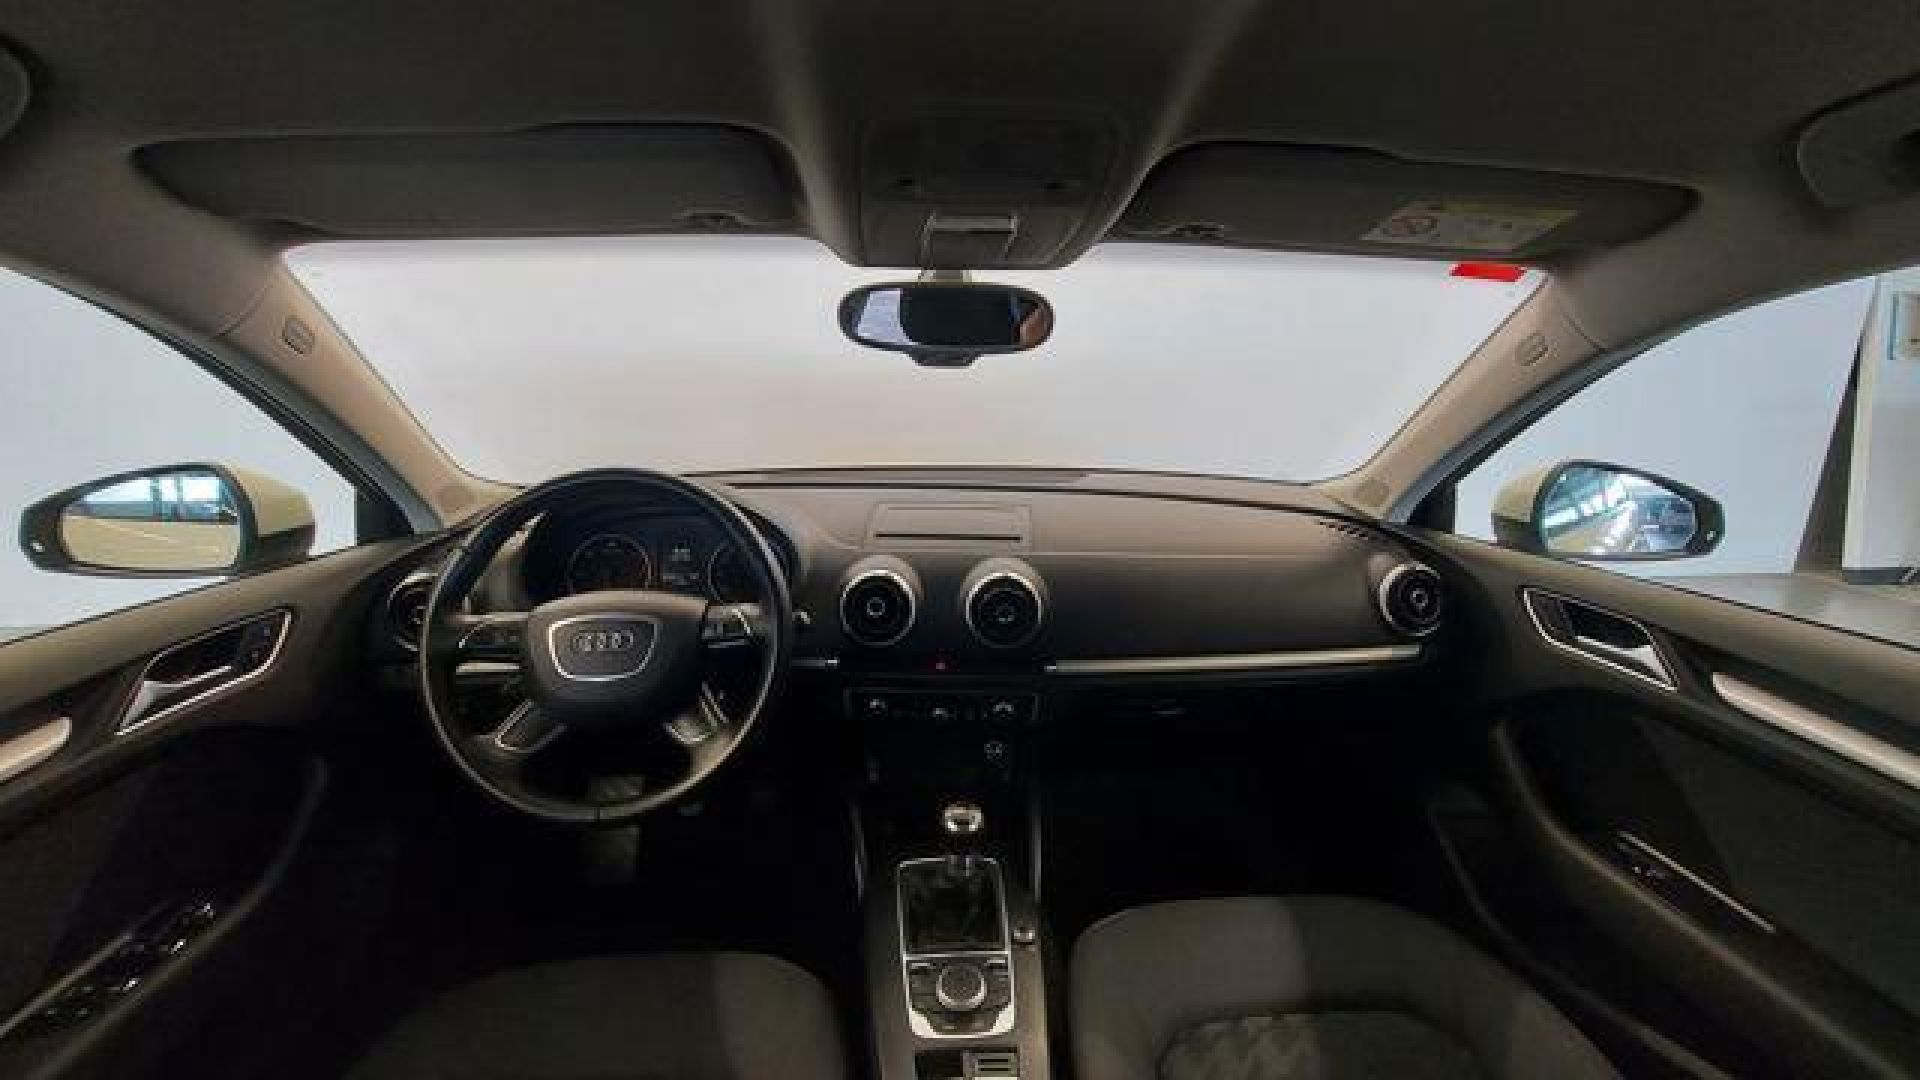 Audi A3 Sportback Attraction 1.6 TDI 77 kW (105 CV)